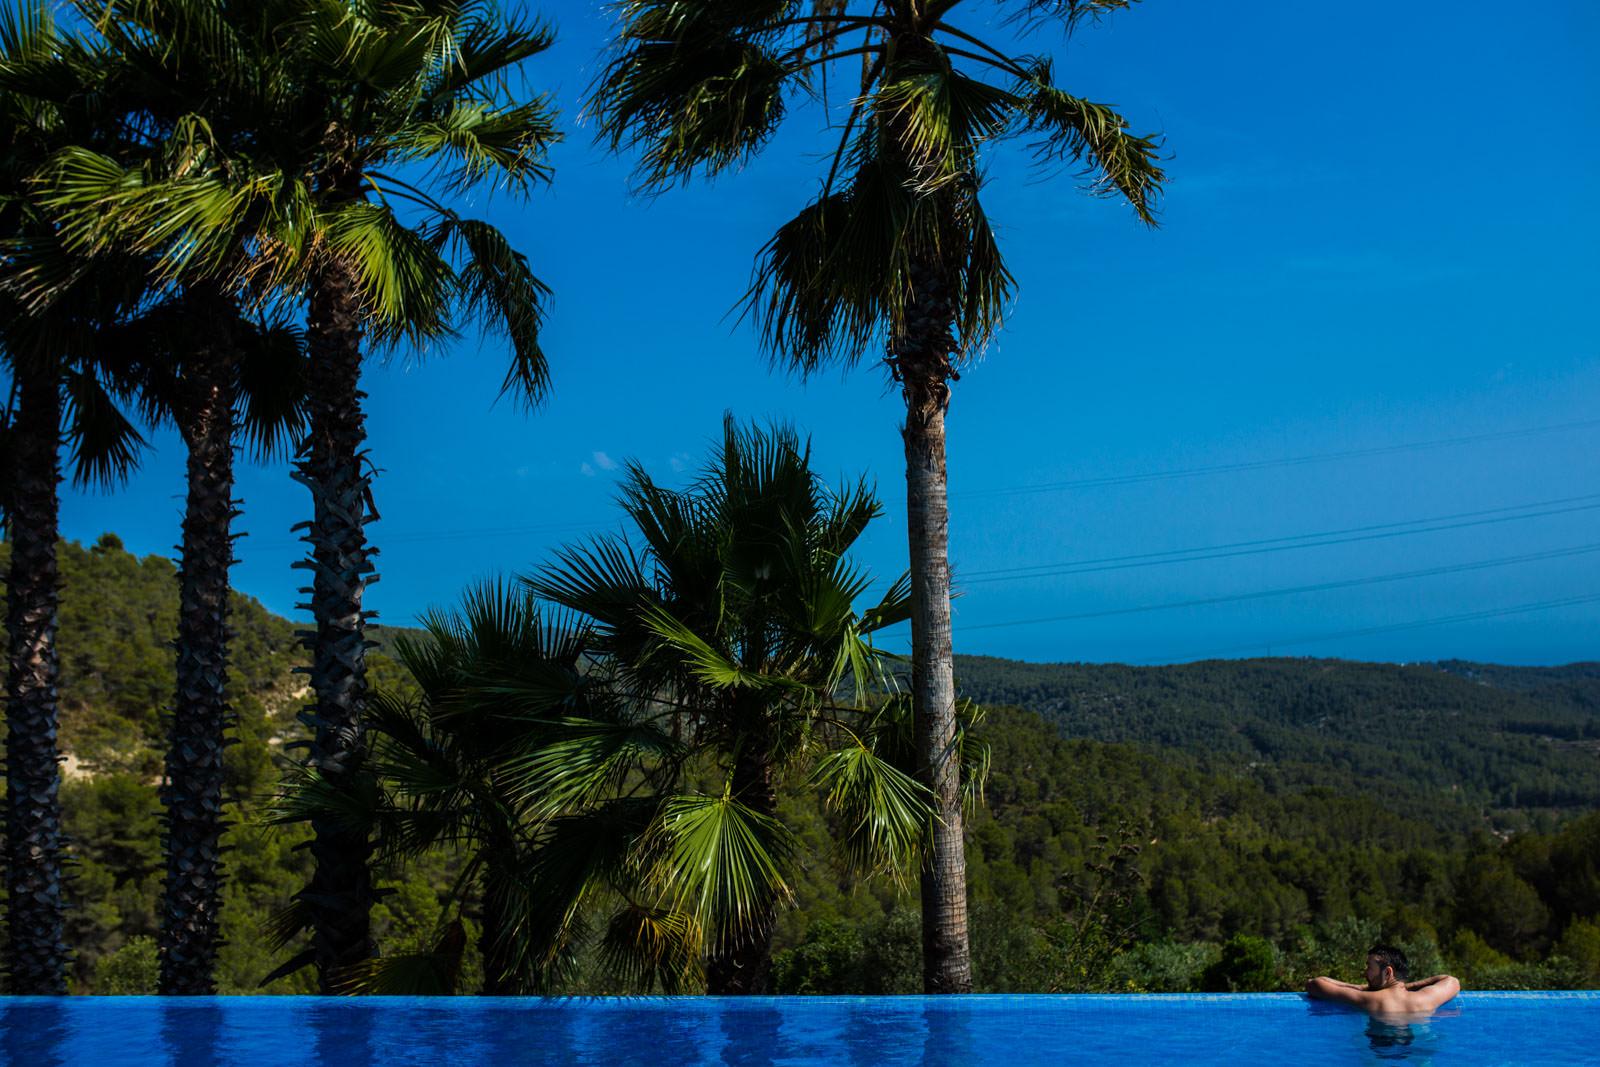 Almirall-Font-sitges-marbella-engagement-Rafael-Torres-fotografo-bodas-sevilla-madrid-barcelona-wedding-photographer--1.jpg